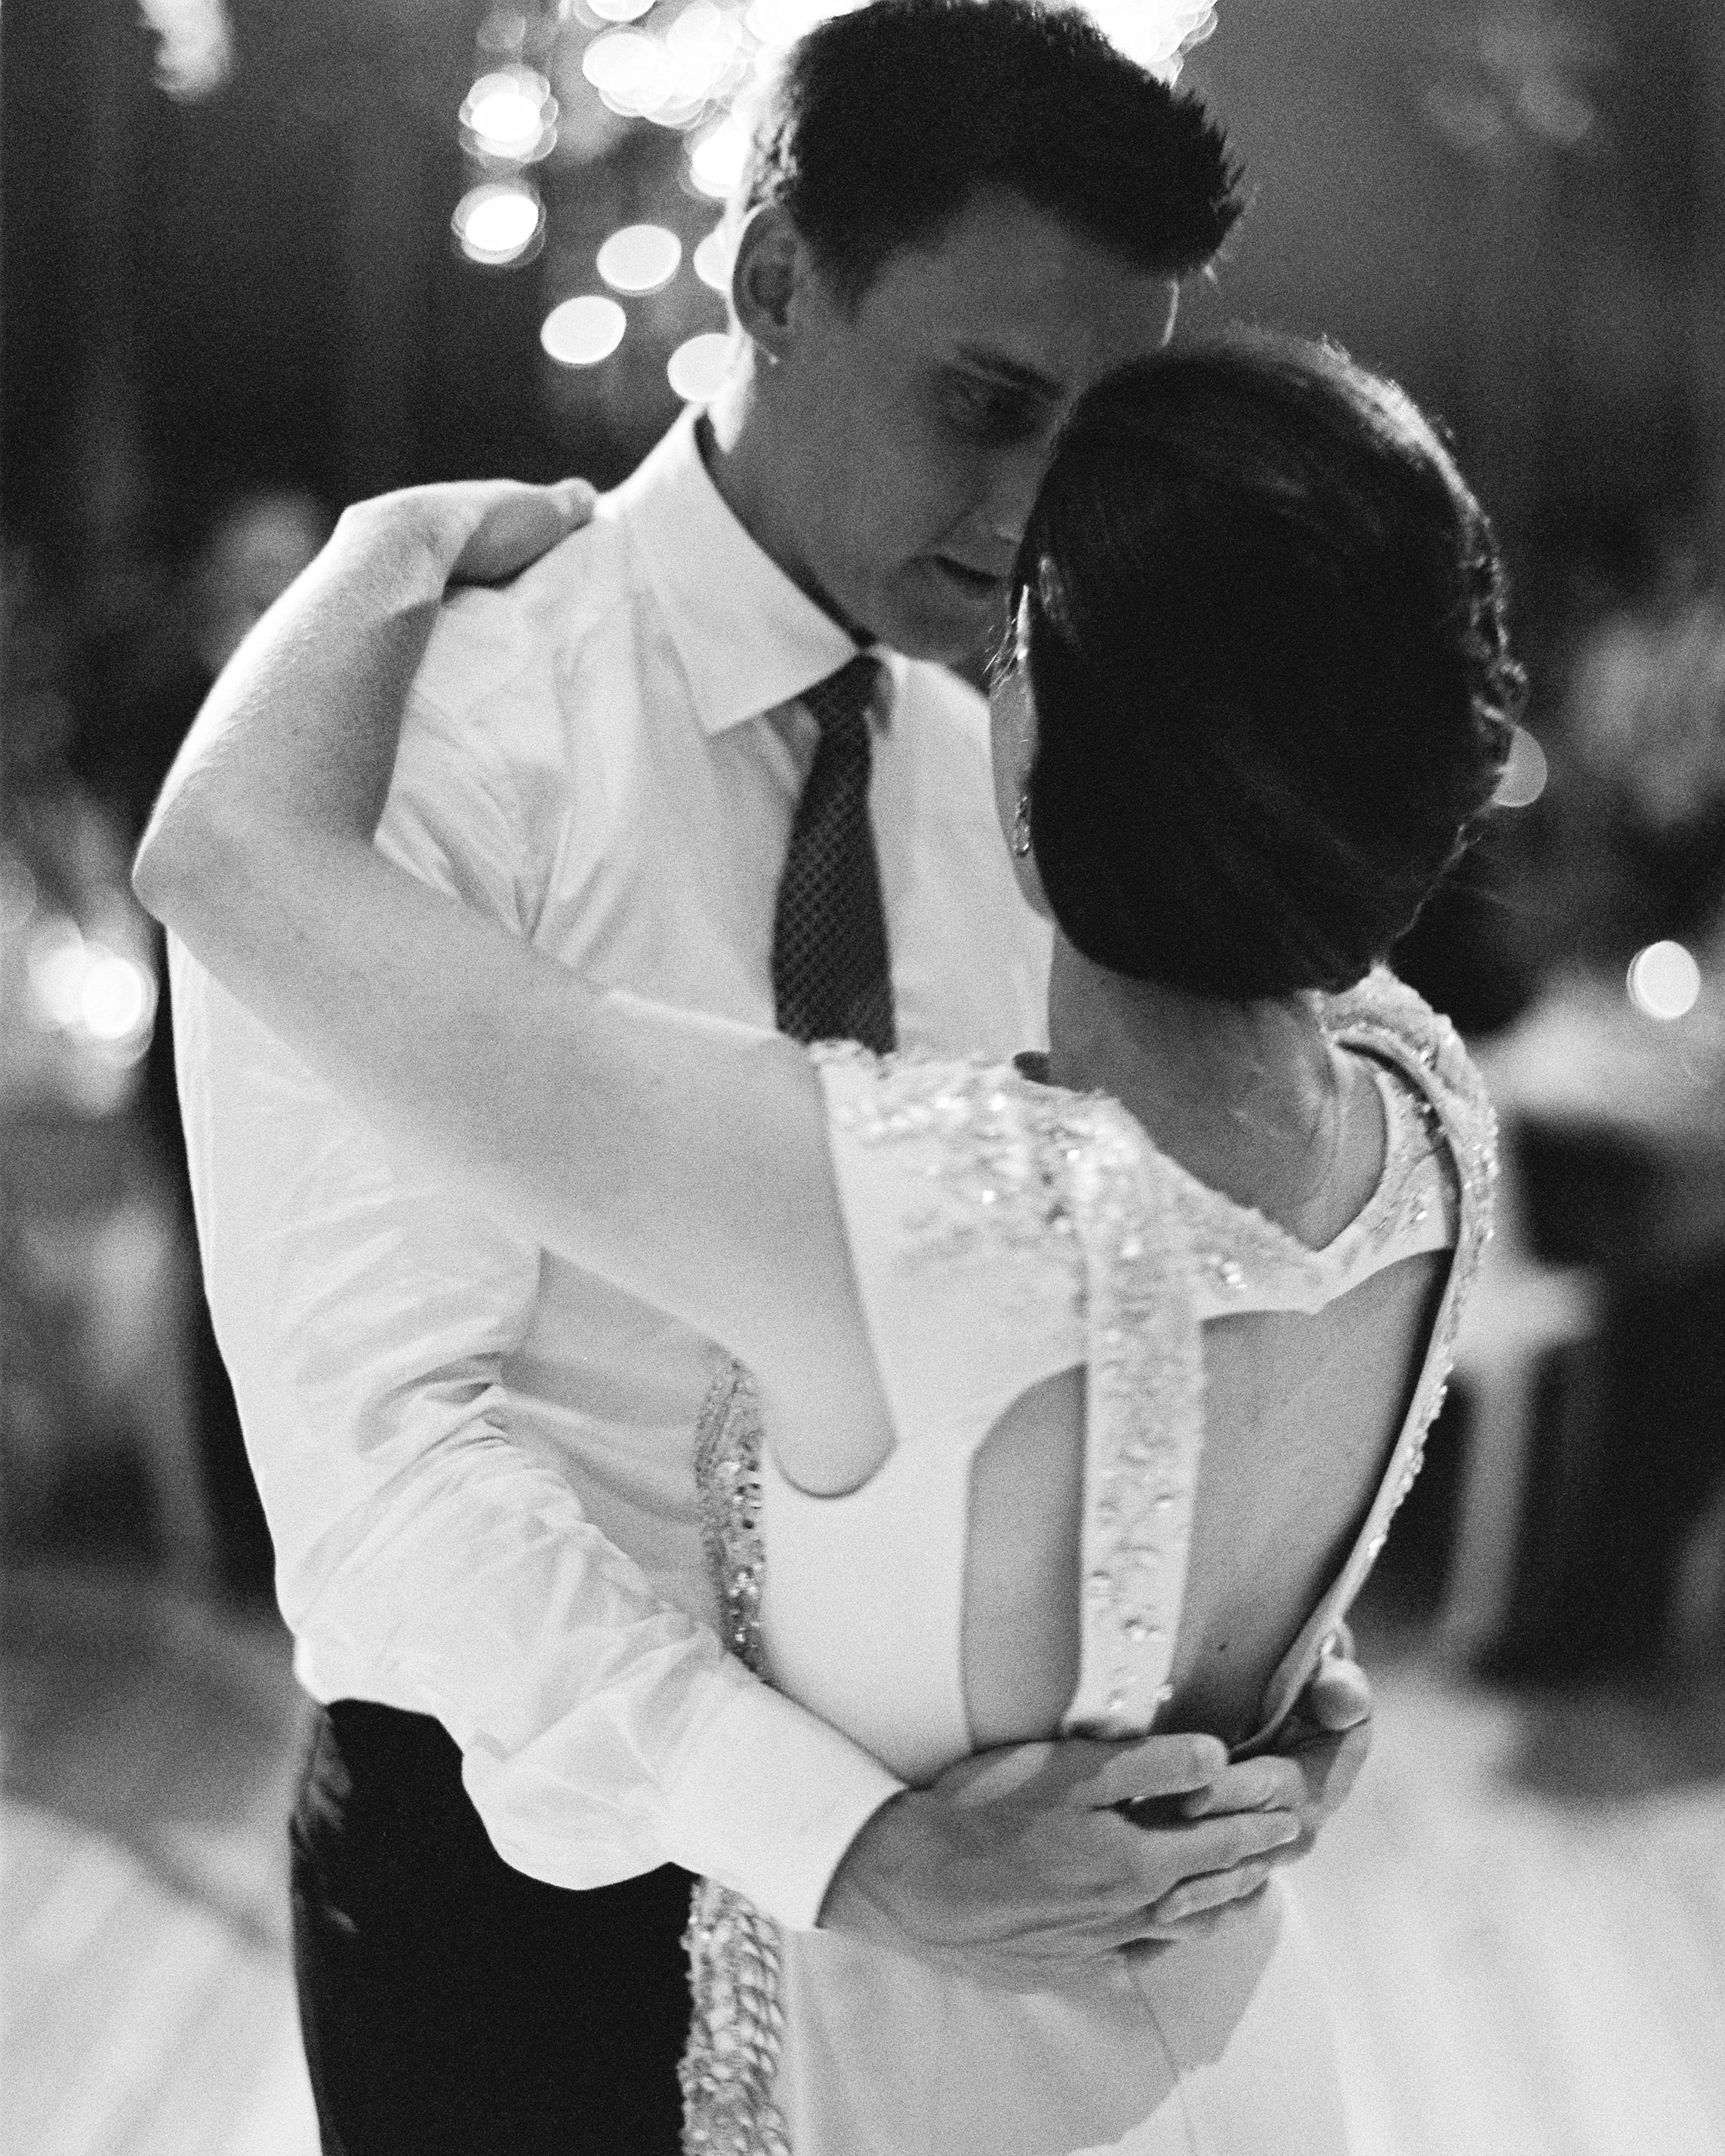 molly-thomas-dancing-003-wds109687.jpg